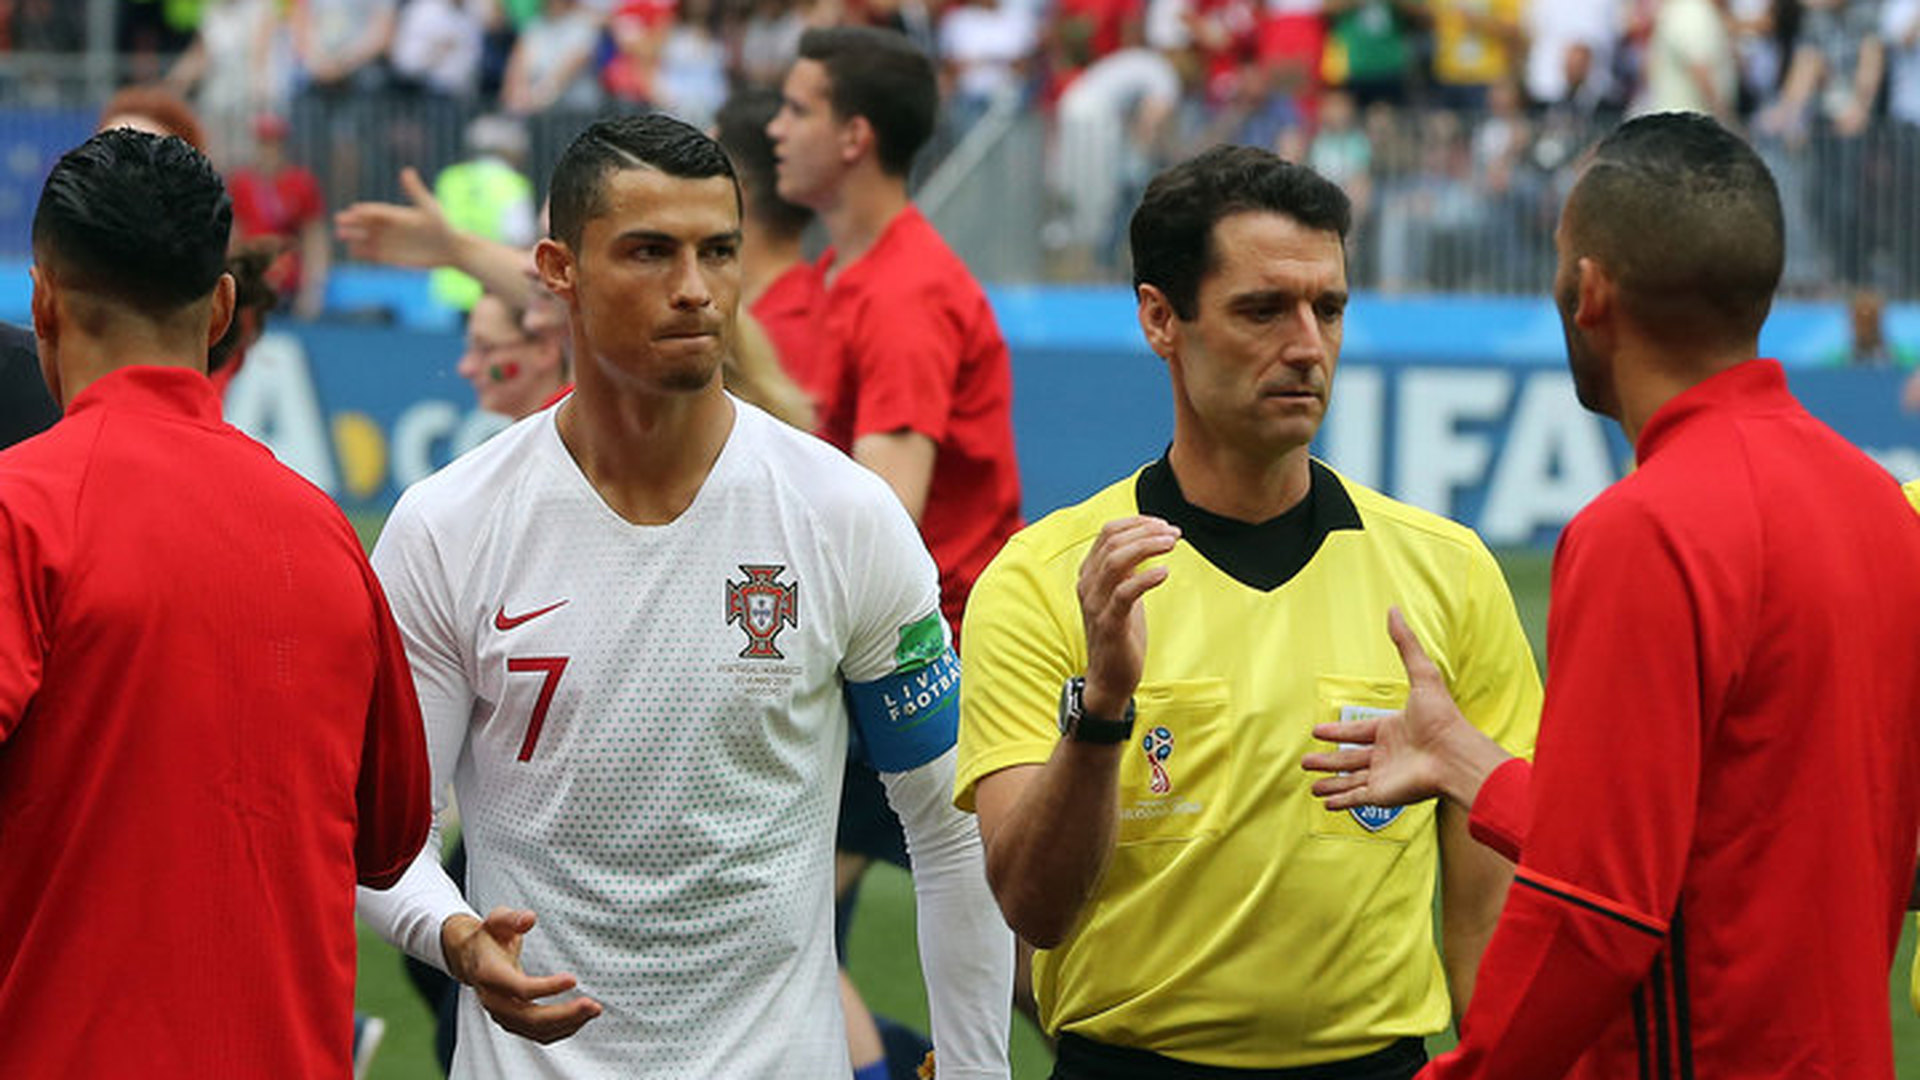 Арбитр в перерыве матча Португалия – Марокко попросил у Роналду футболку